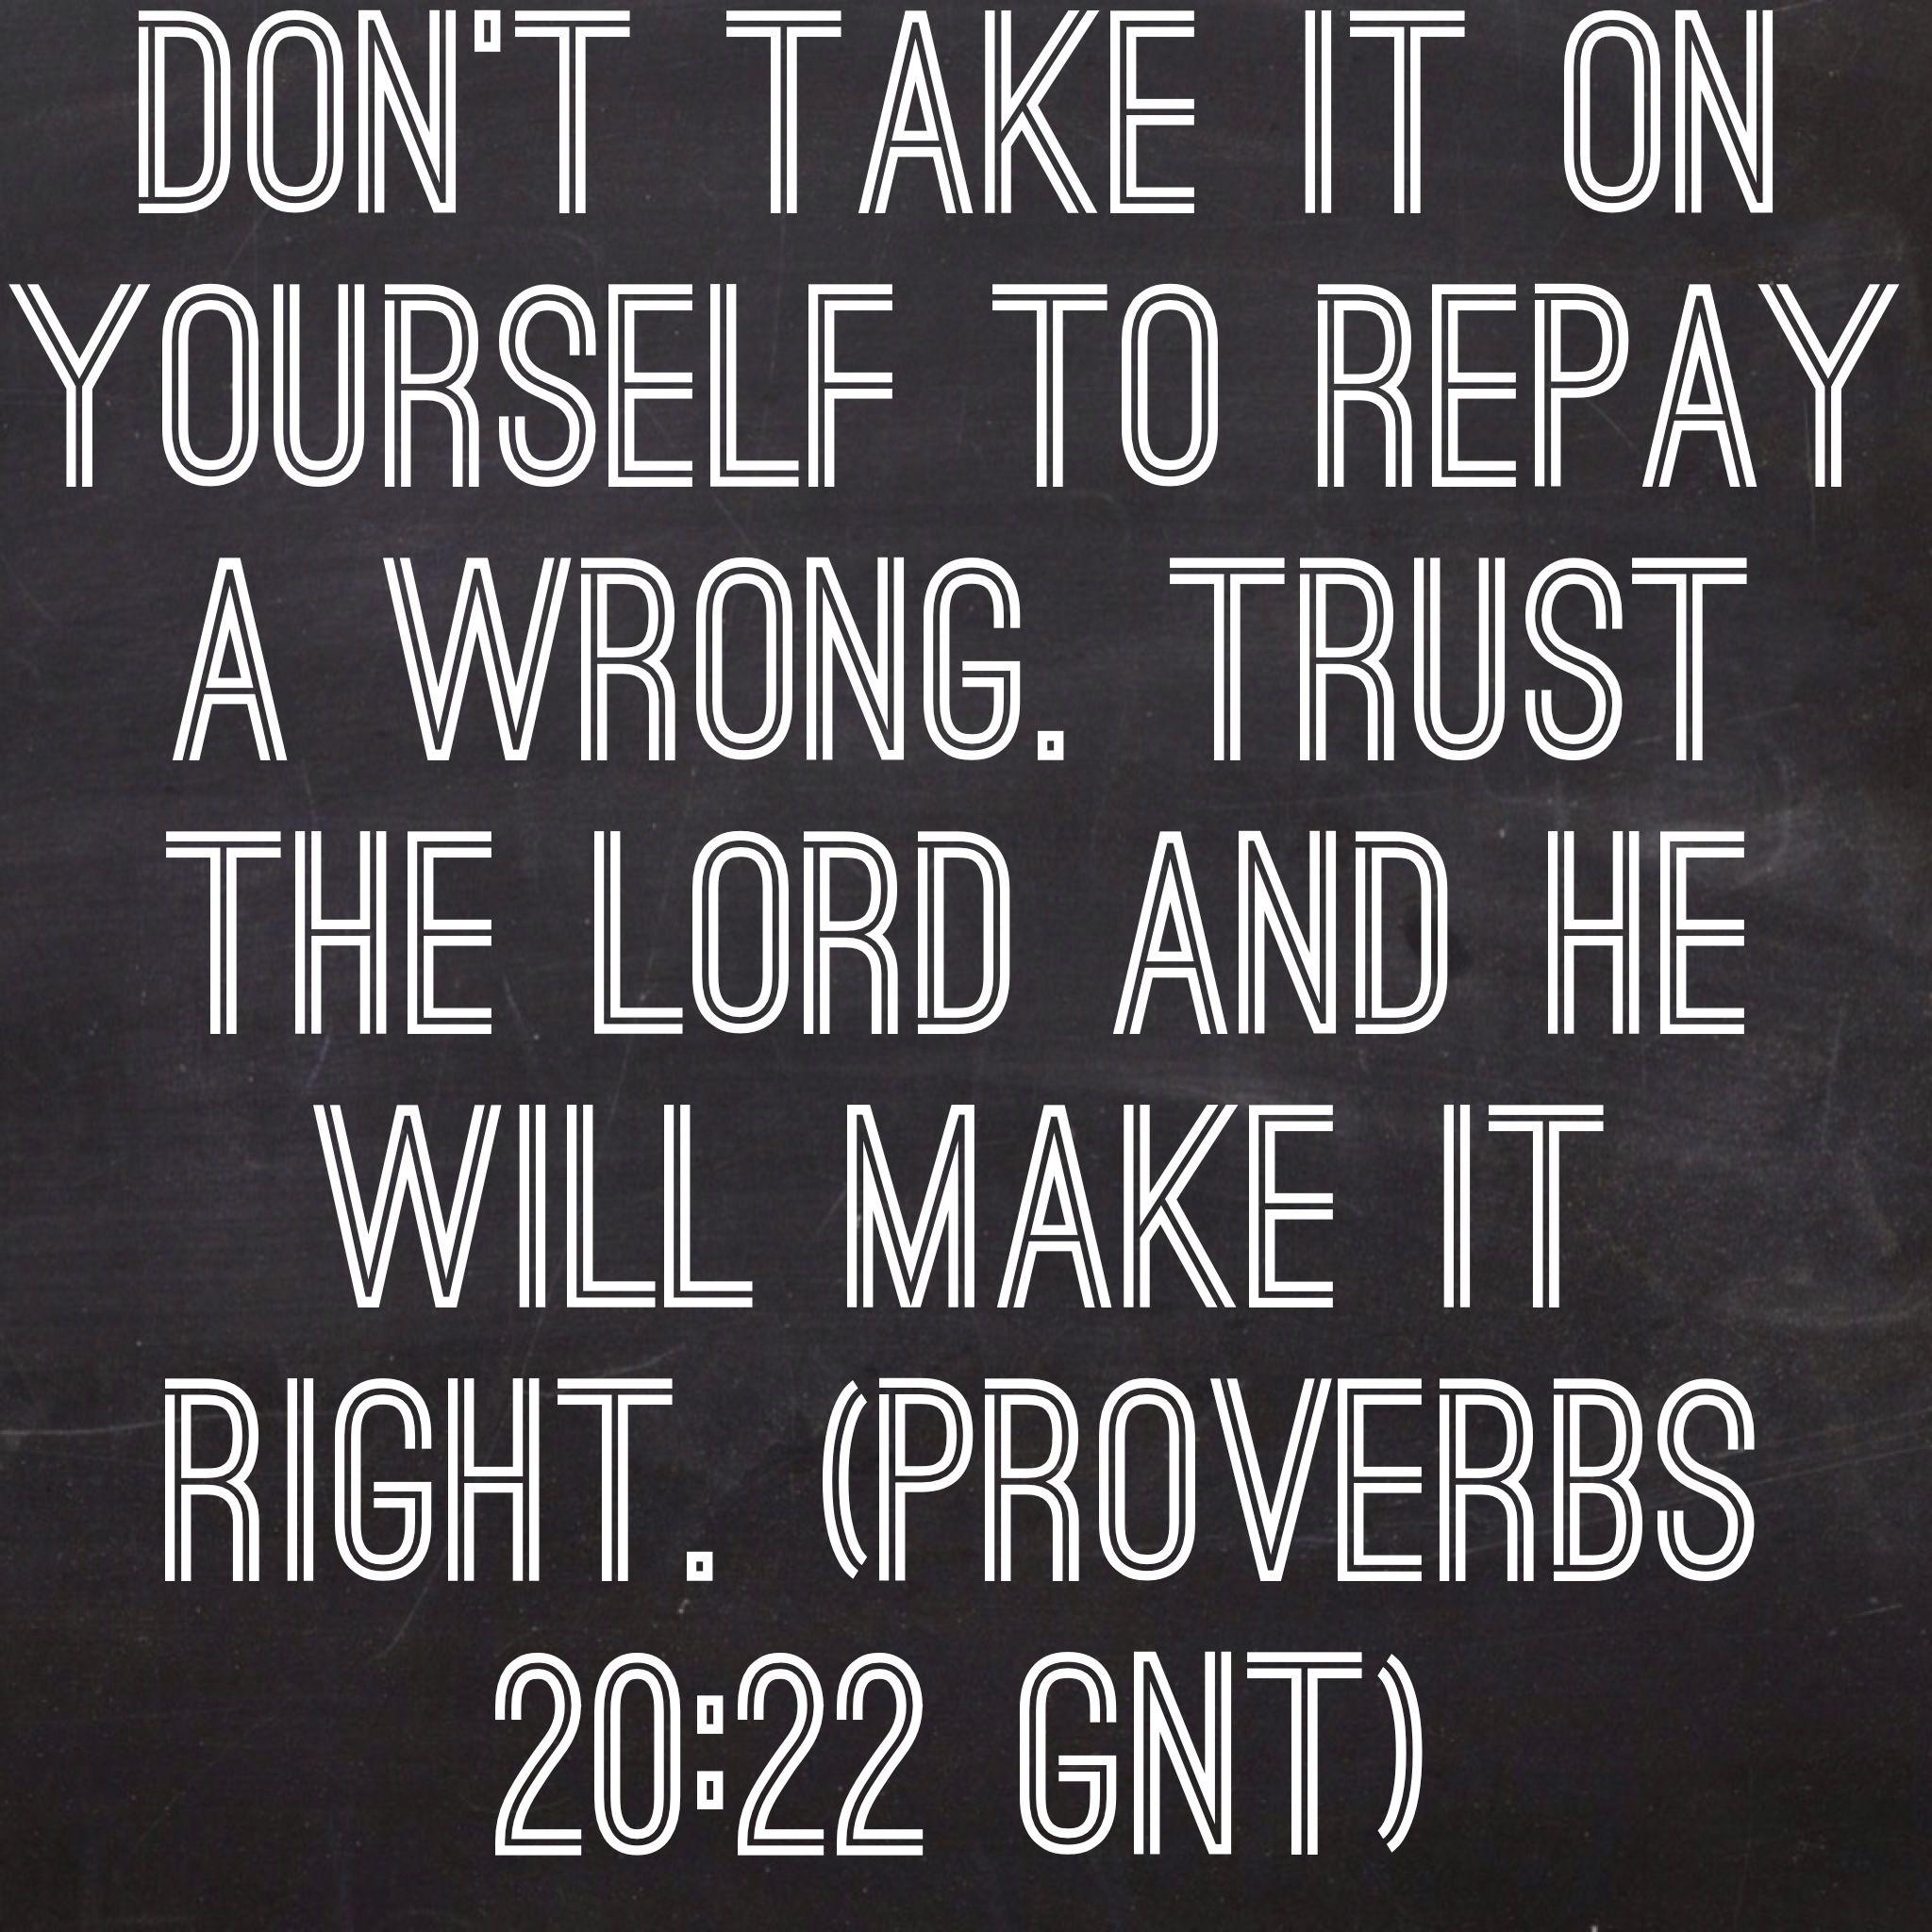 Bible Quotes Revenge: Revenge Is God, Alone!